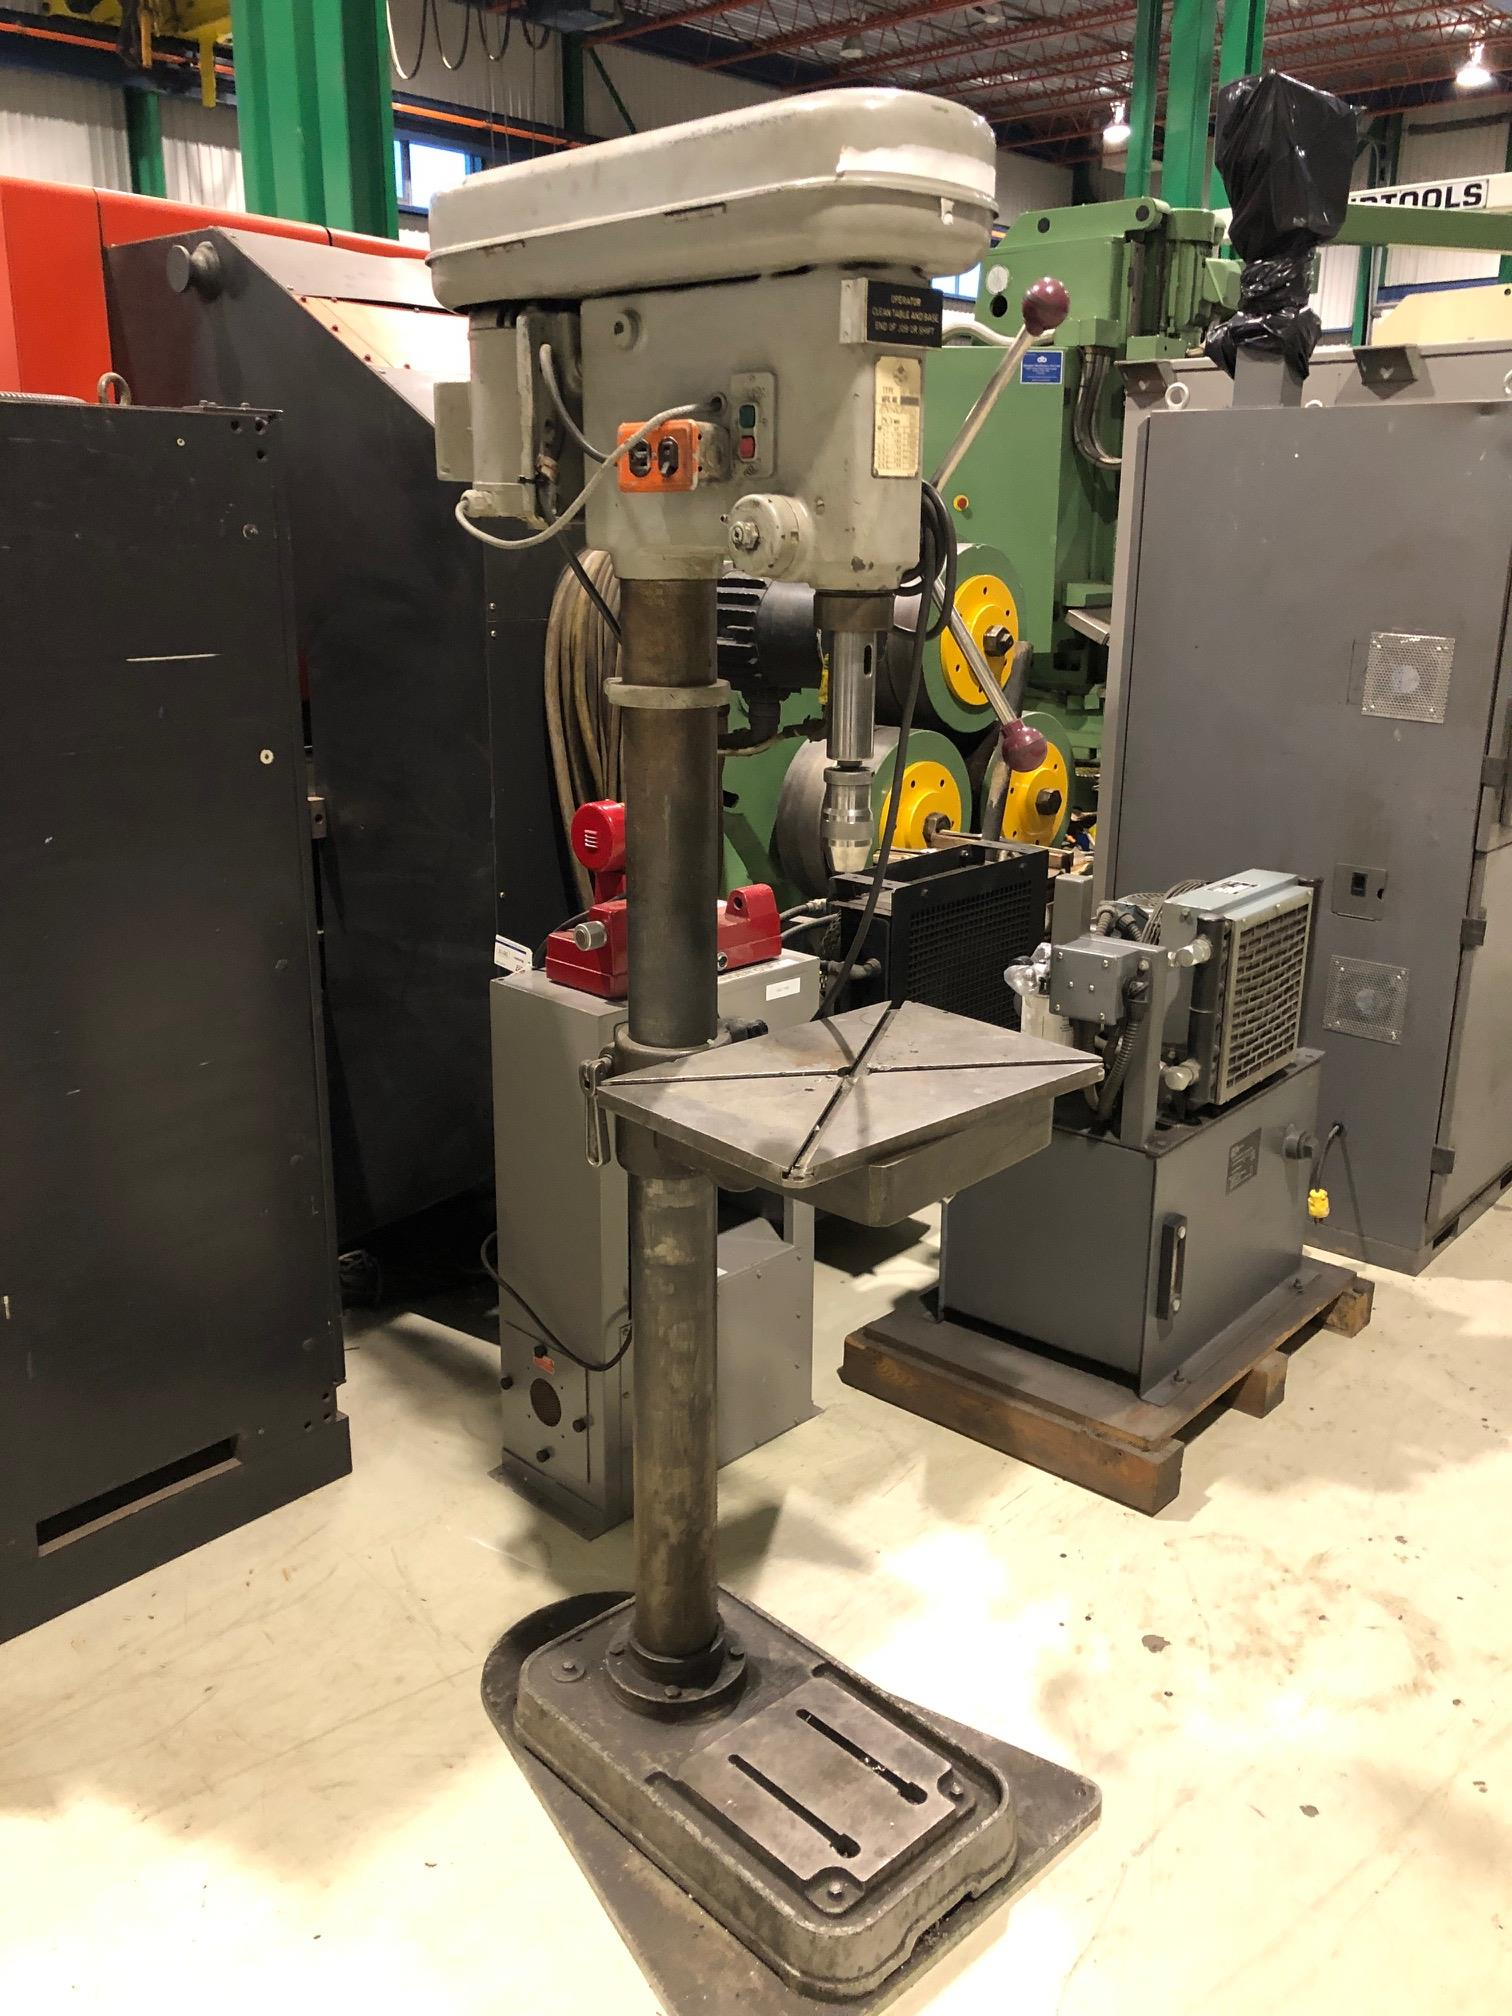 JET PEDESTAL DRILL MOD. 420F3P, 190-3000 RPM, 120V - Image 3 of 3